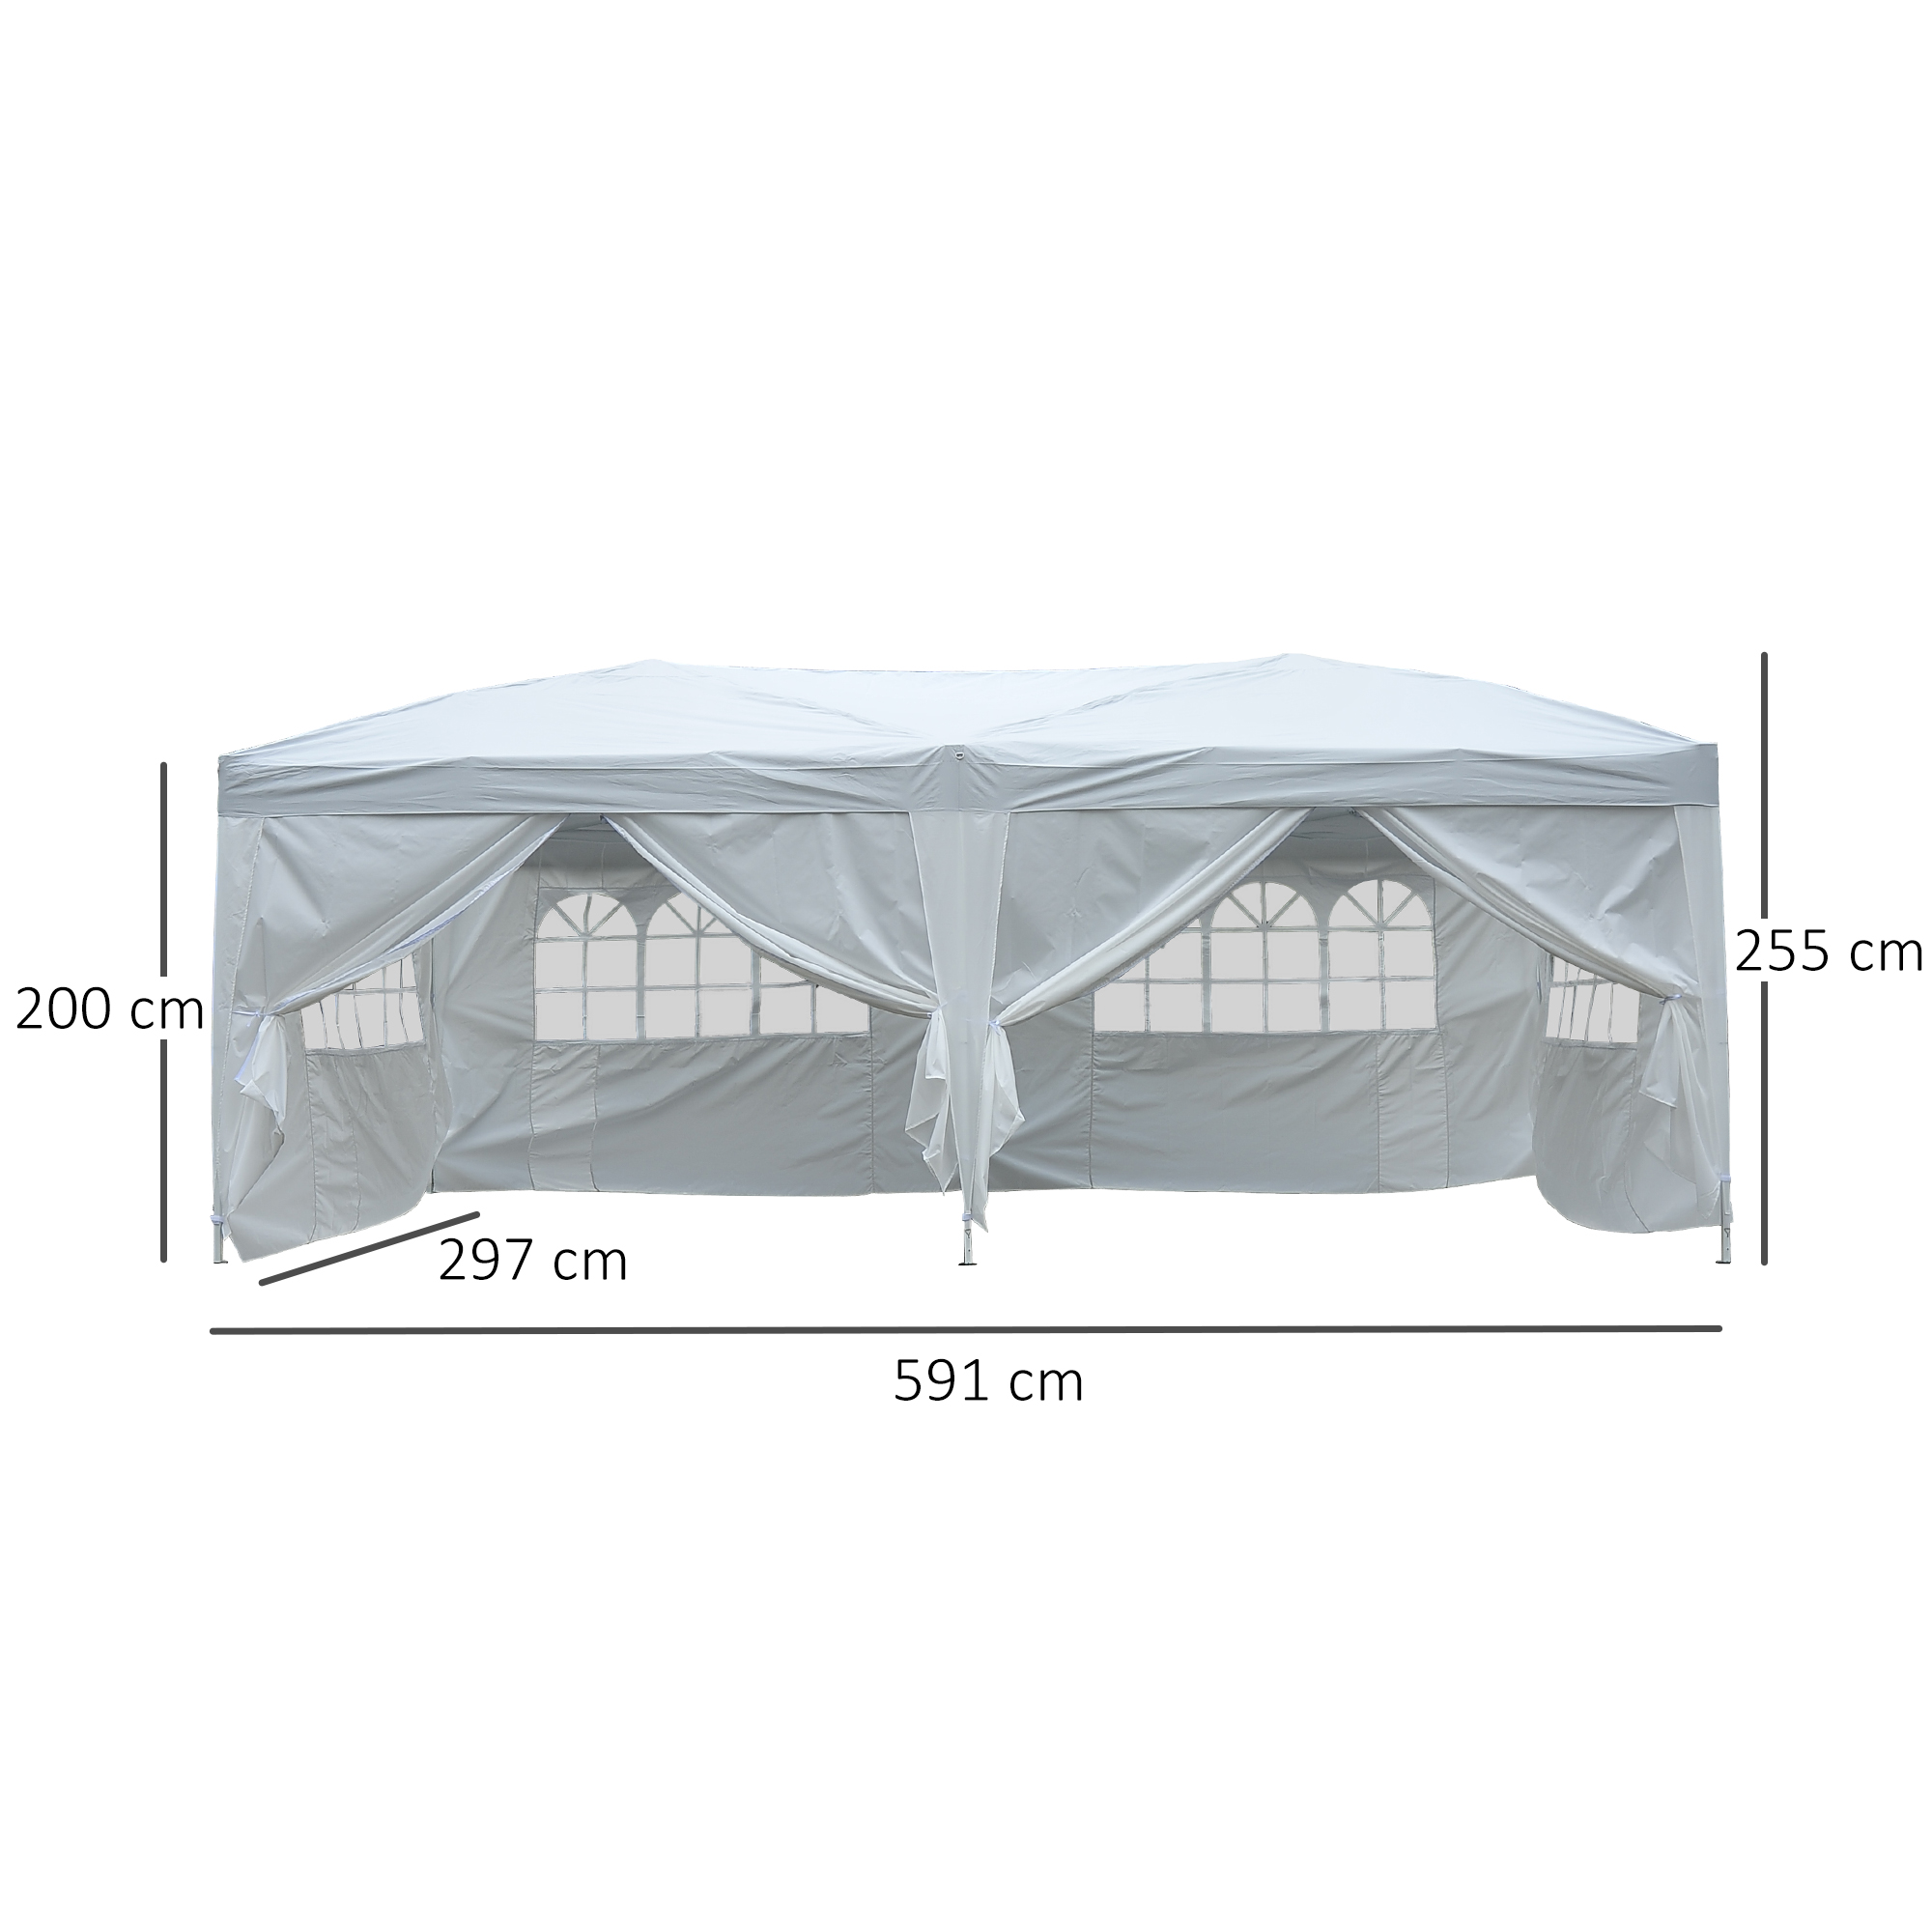 Indexbild 20 - Outsunny 3x6m Faltpavillon Pavillon Zelt Partyzelt Gartenzelt Faltbar Weiß/Blau